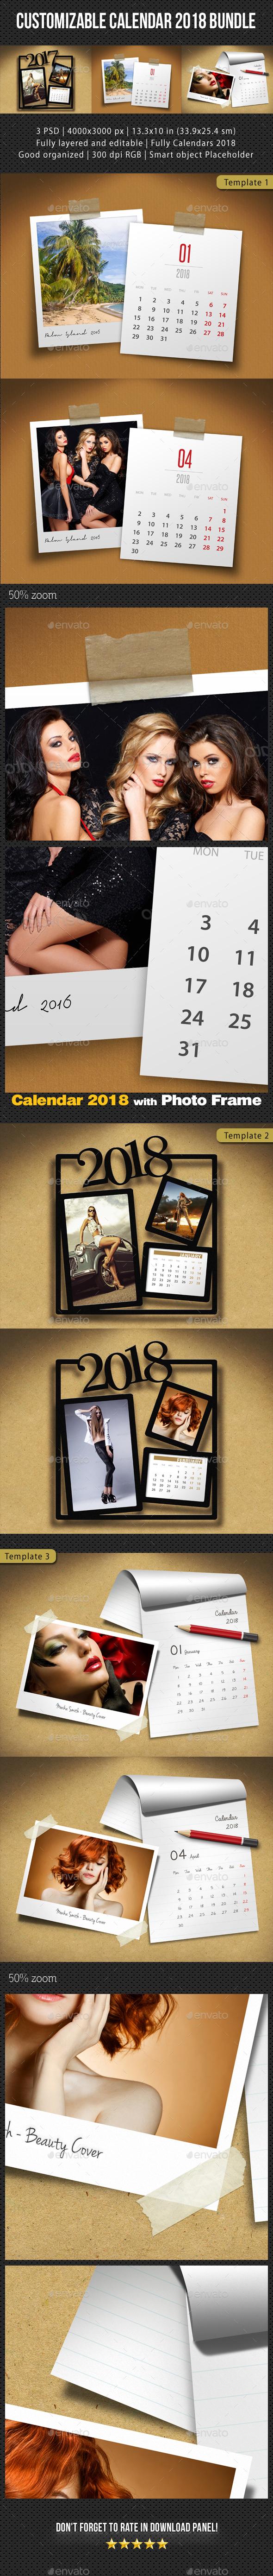 3 in 1 Customizable Calendar 2018 Bundle V02 - Miscellaneous Photo Templates